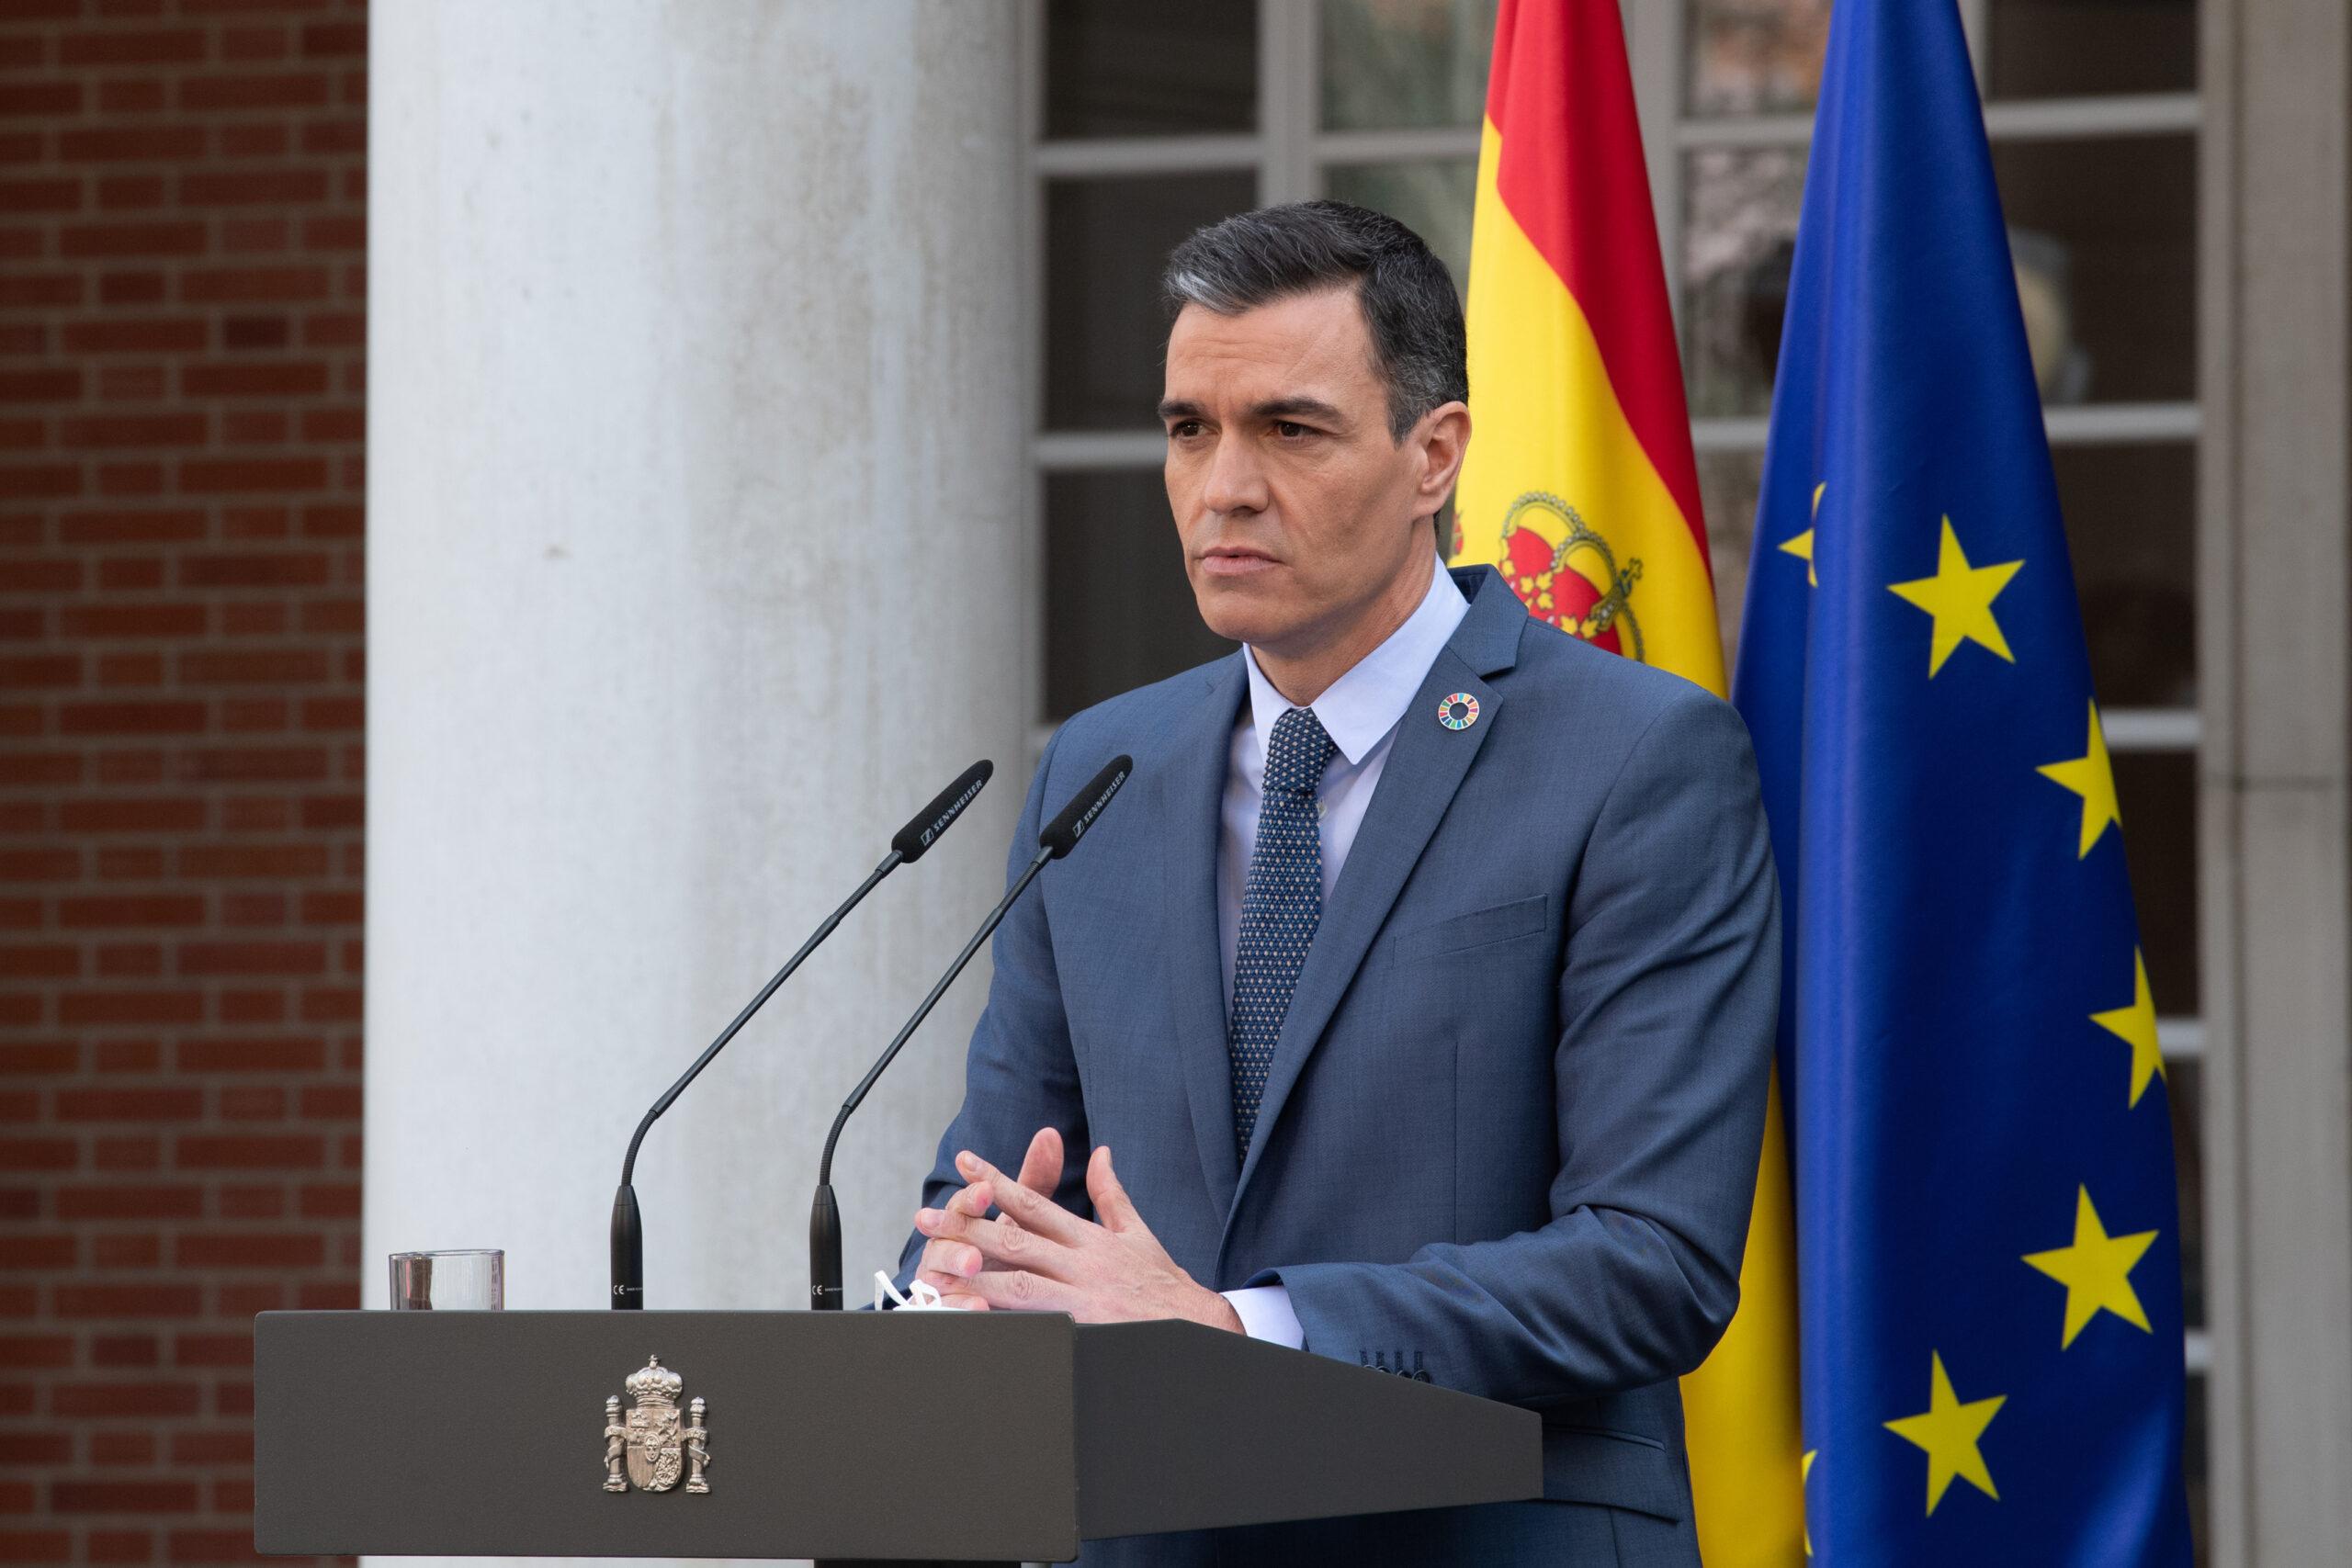 El president del govern espanyol, Pedro Sánchez, en roda de premsa a La Moncloa   ACN